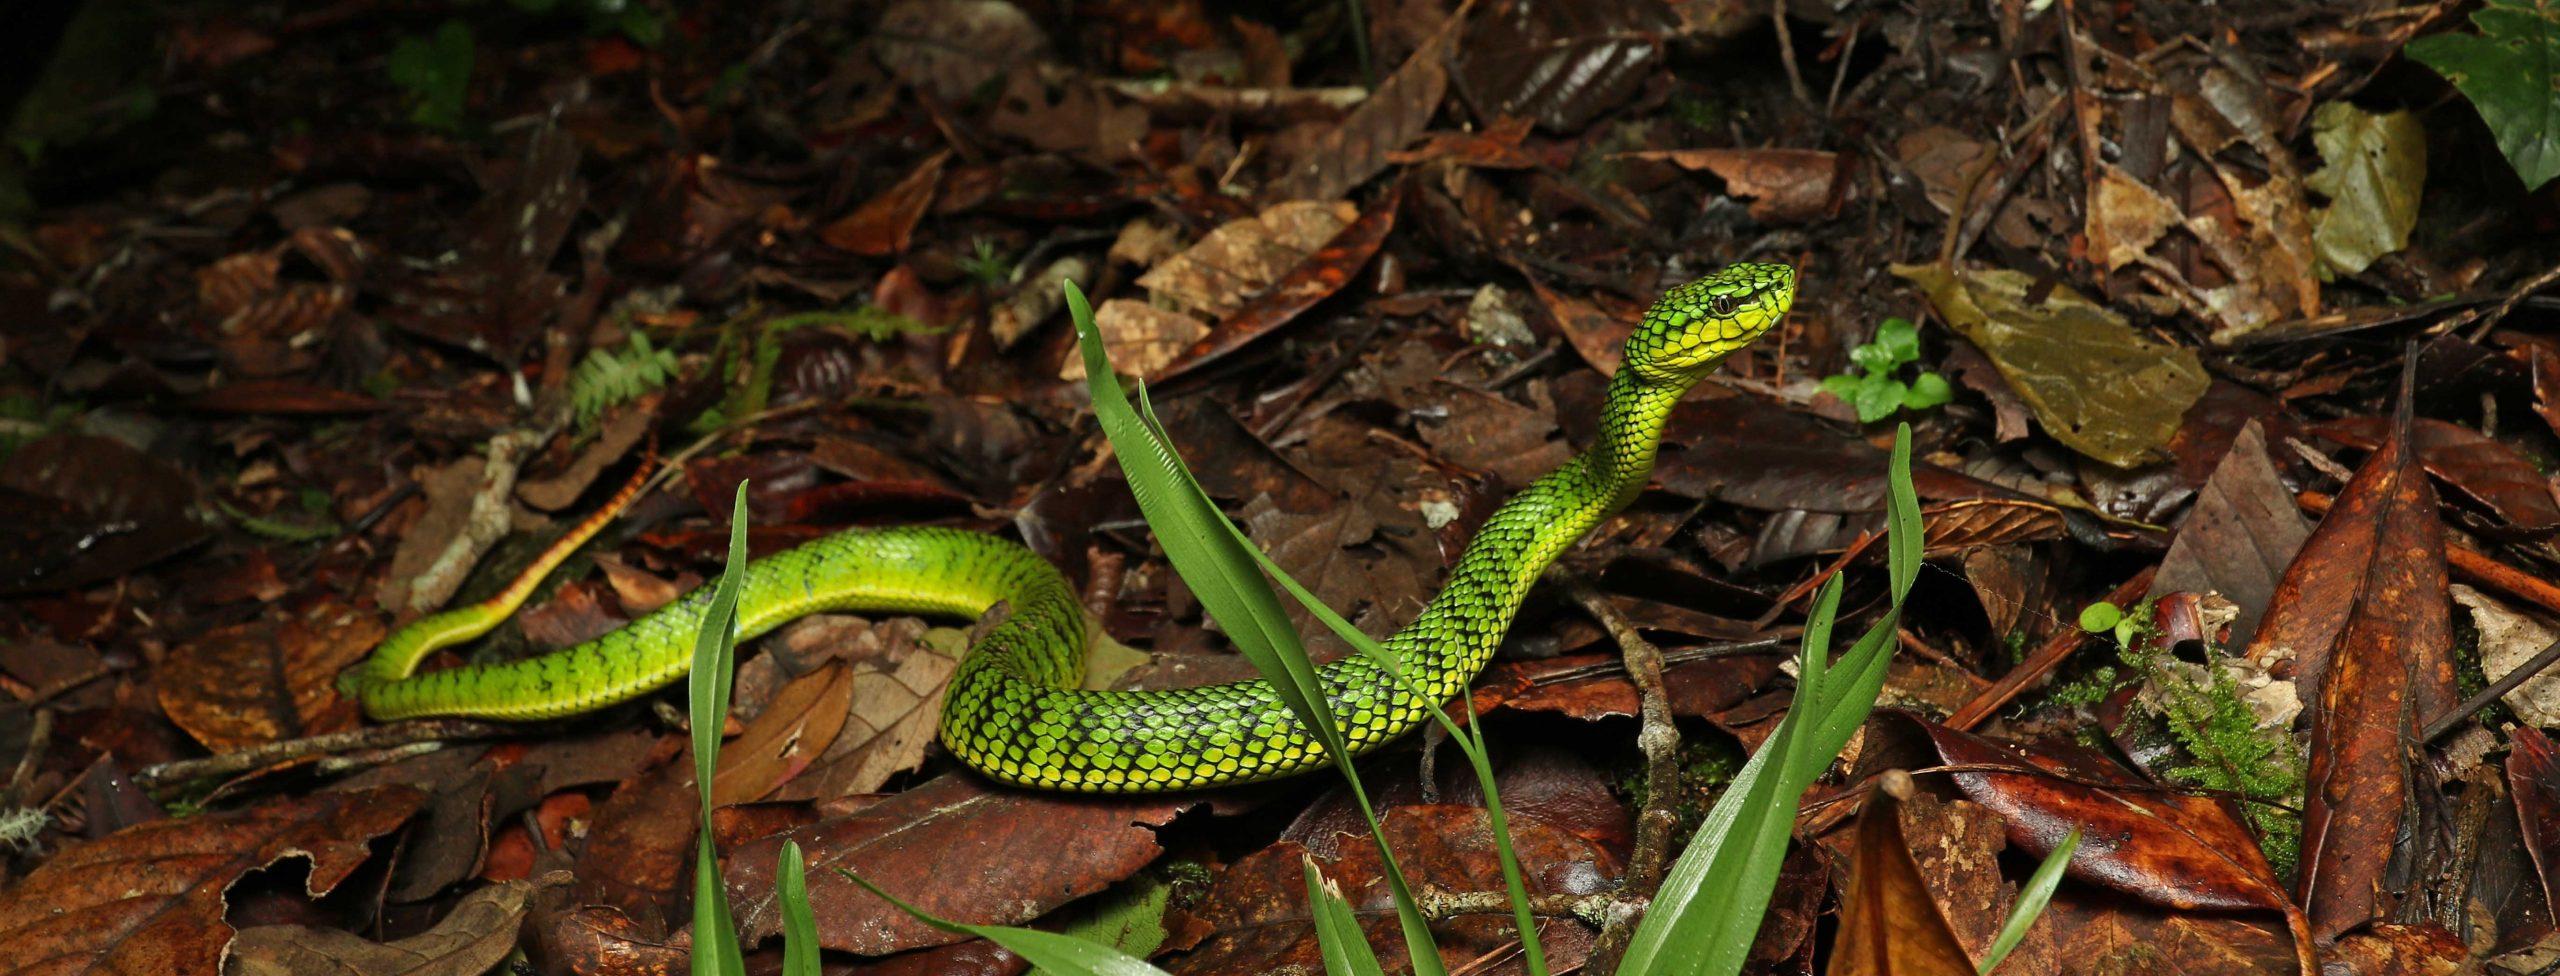 Amphibian & Reptile Travels